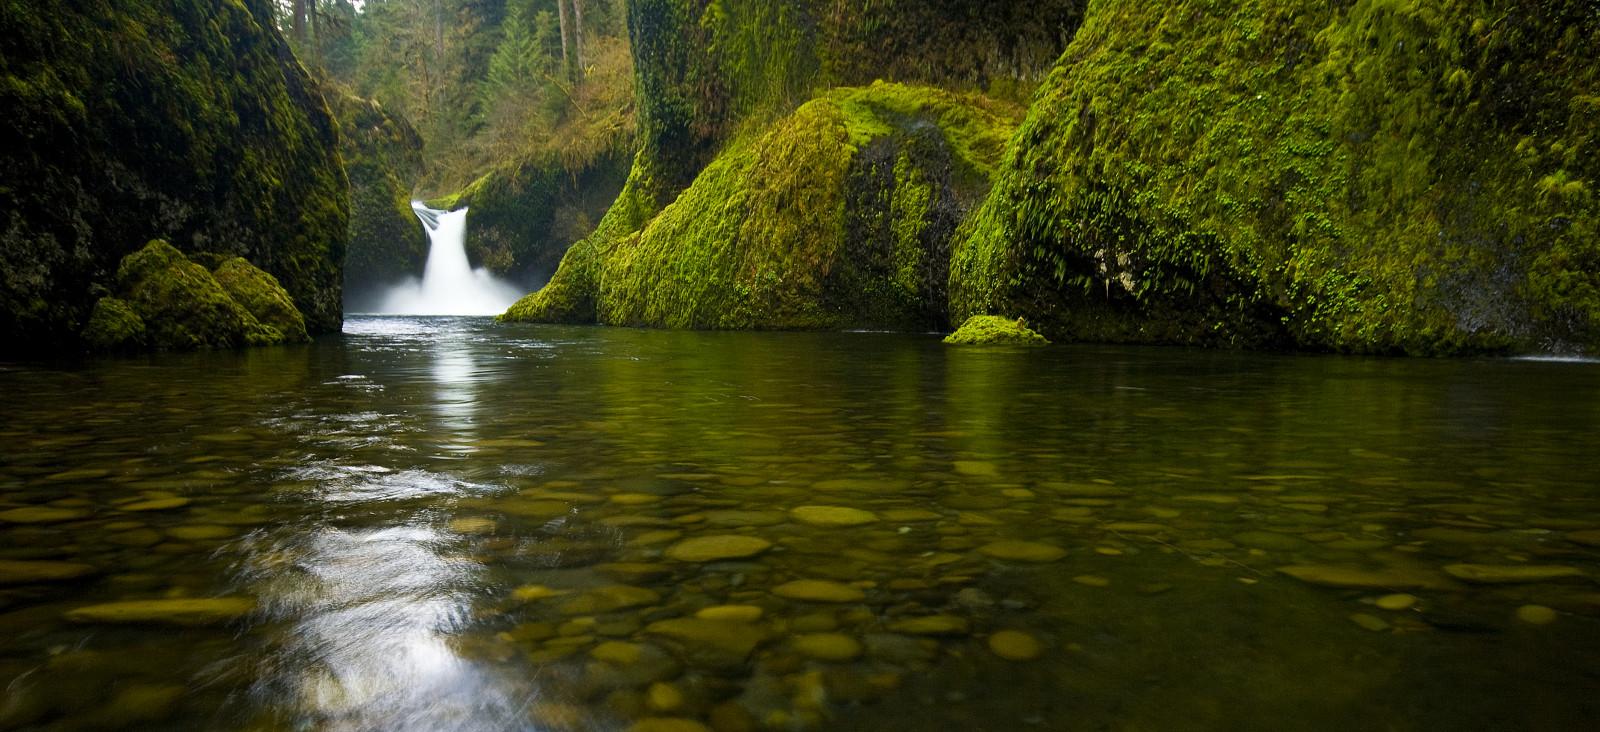 Nature Wallpaper Waterfall Columbia River Oregon: Wallpaper : Landscape, Waterfall, Rock, Reflection, Moss